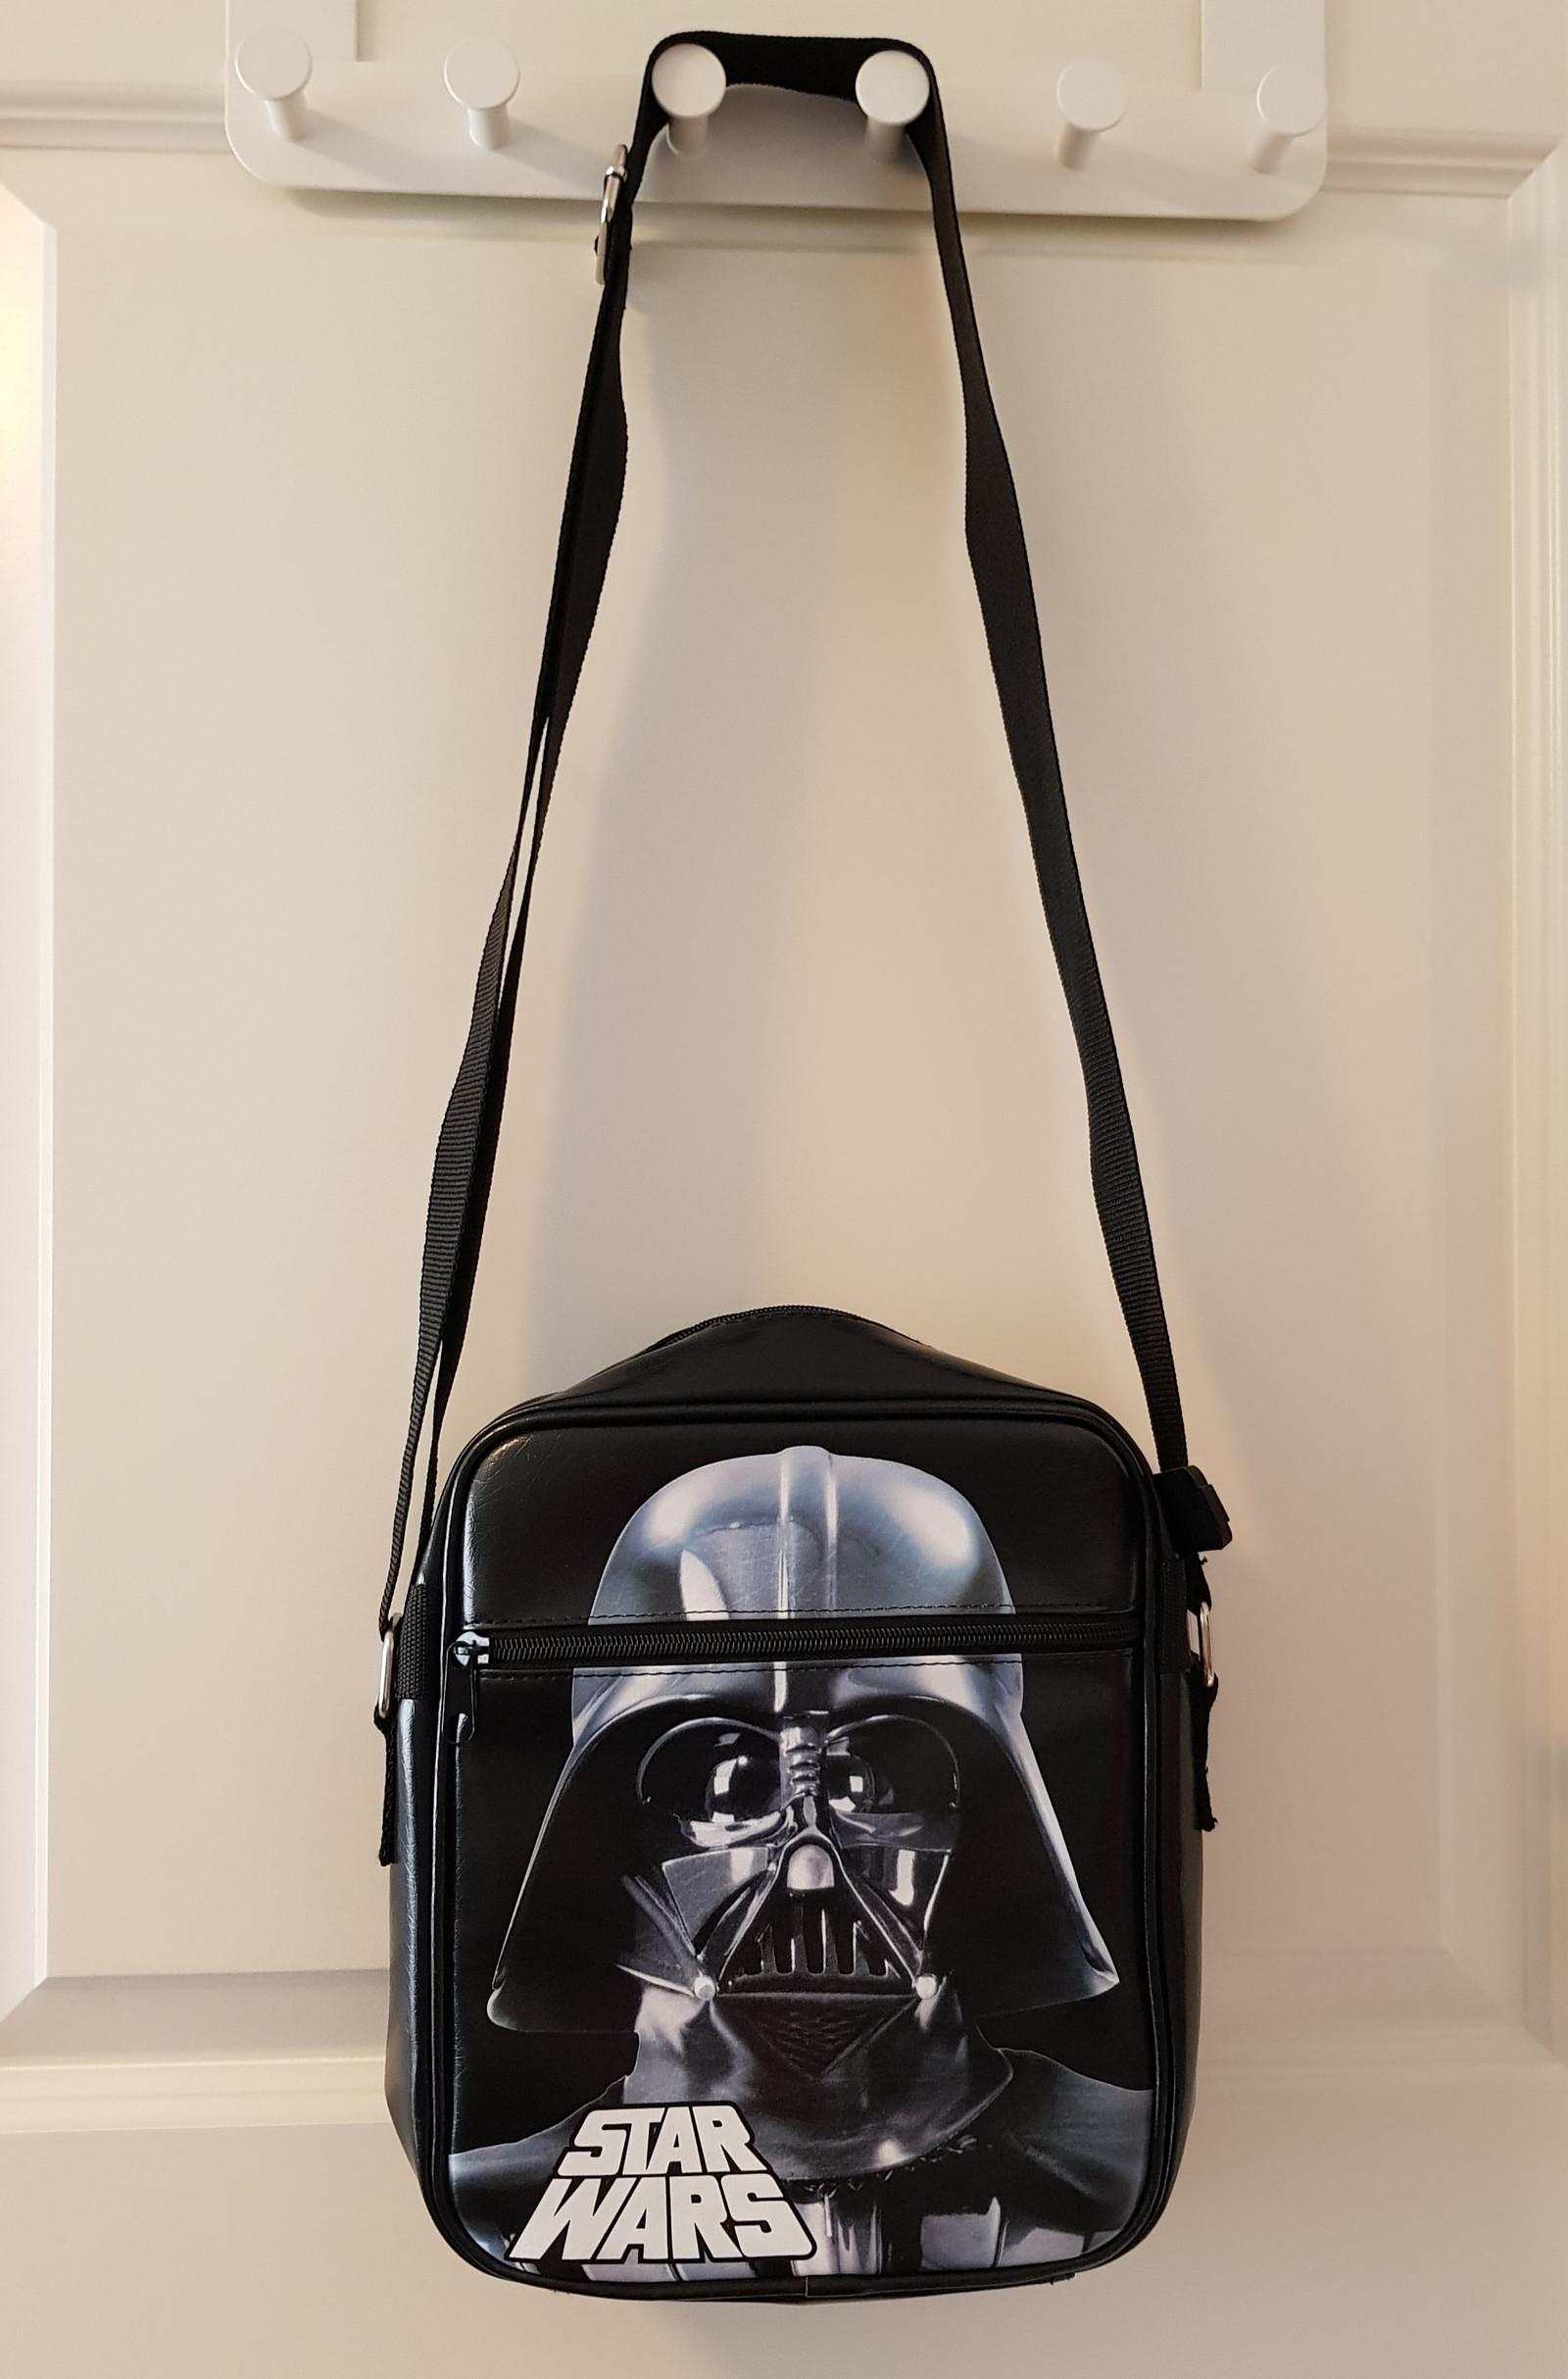 Darth Vader veske, Star Wars, offisiell merch, bag, Sith